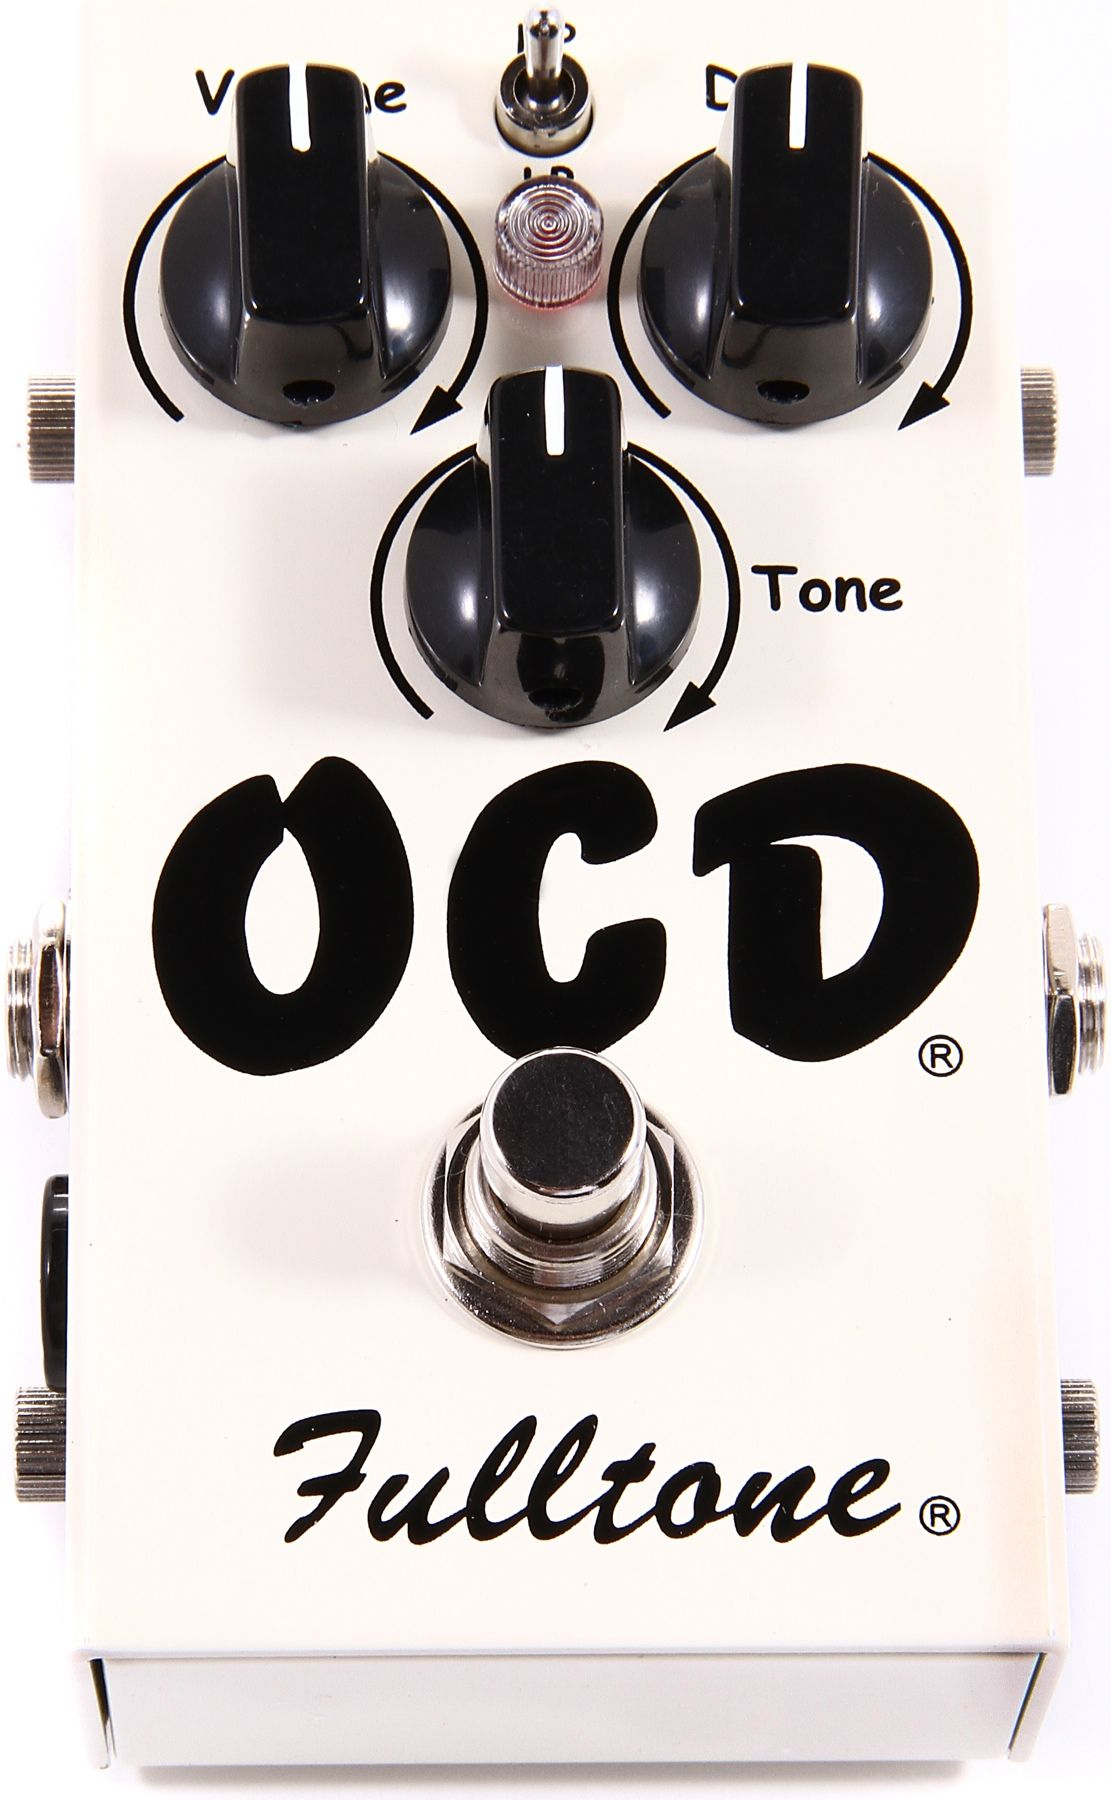 obsessive compulsive drive great guitar pedal names pinterest guitare. Black Bedroom Furniture Sets. Home Design Ideas